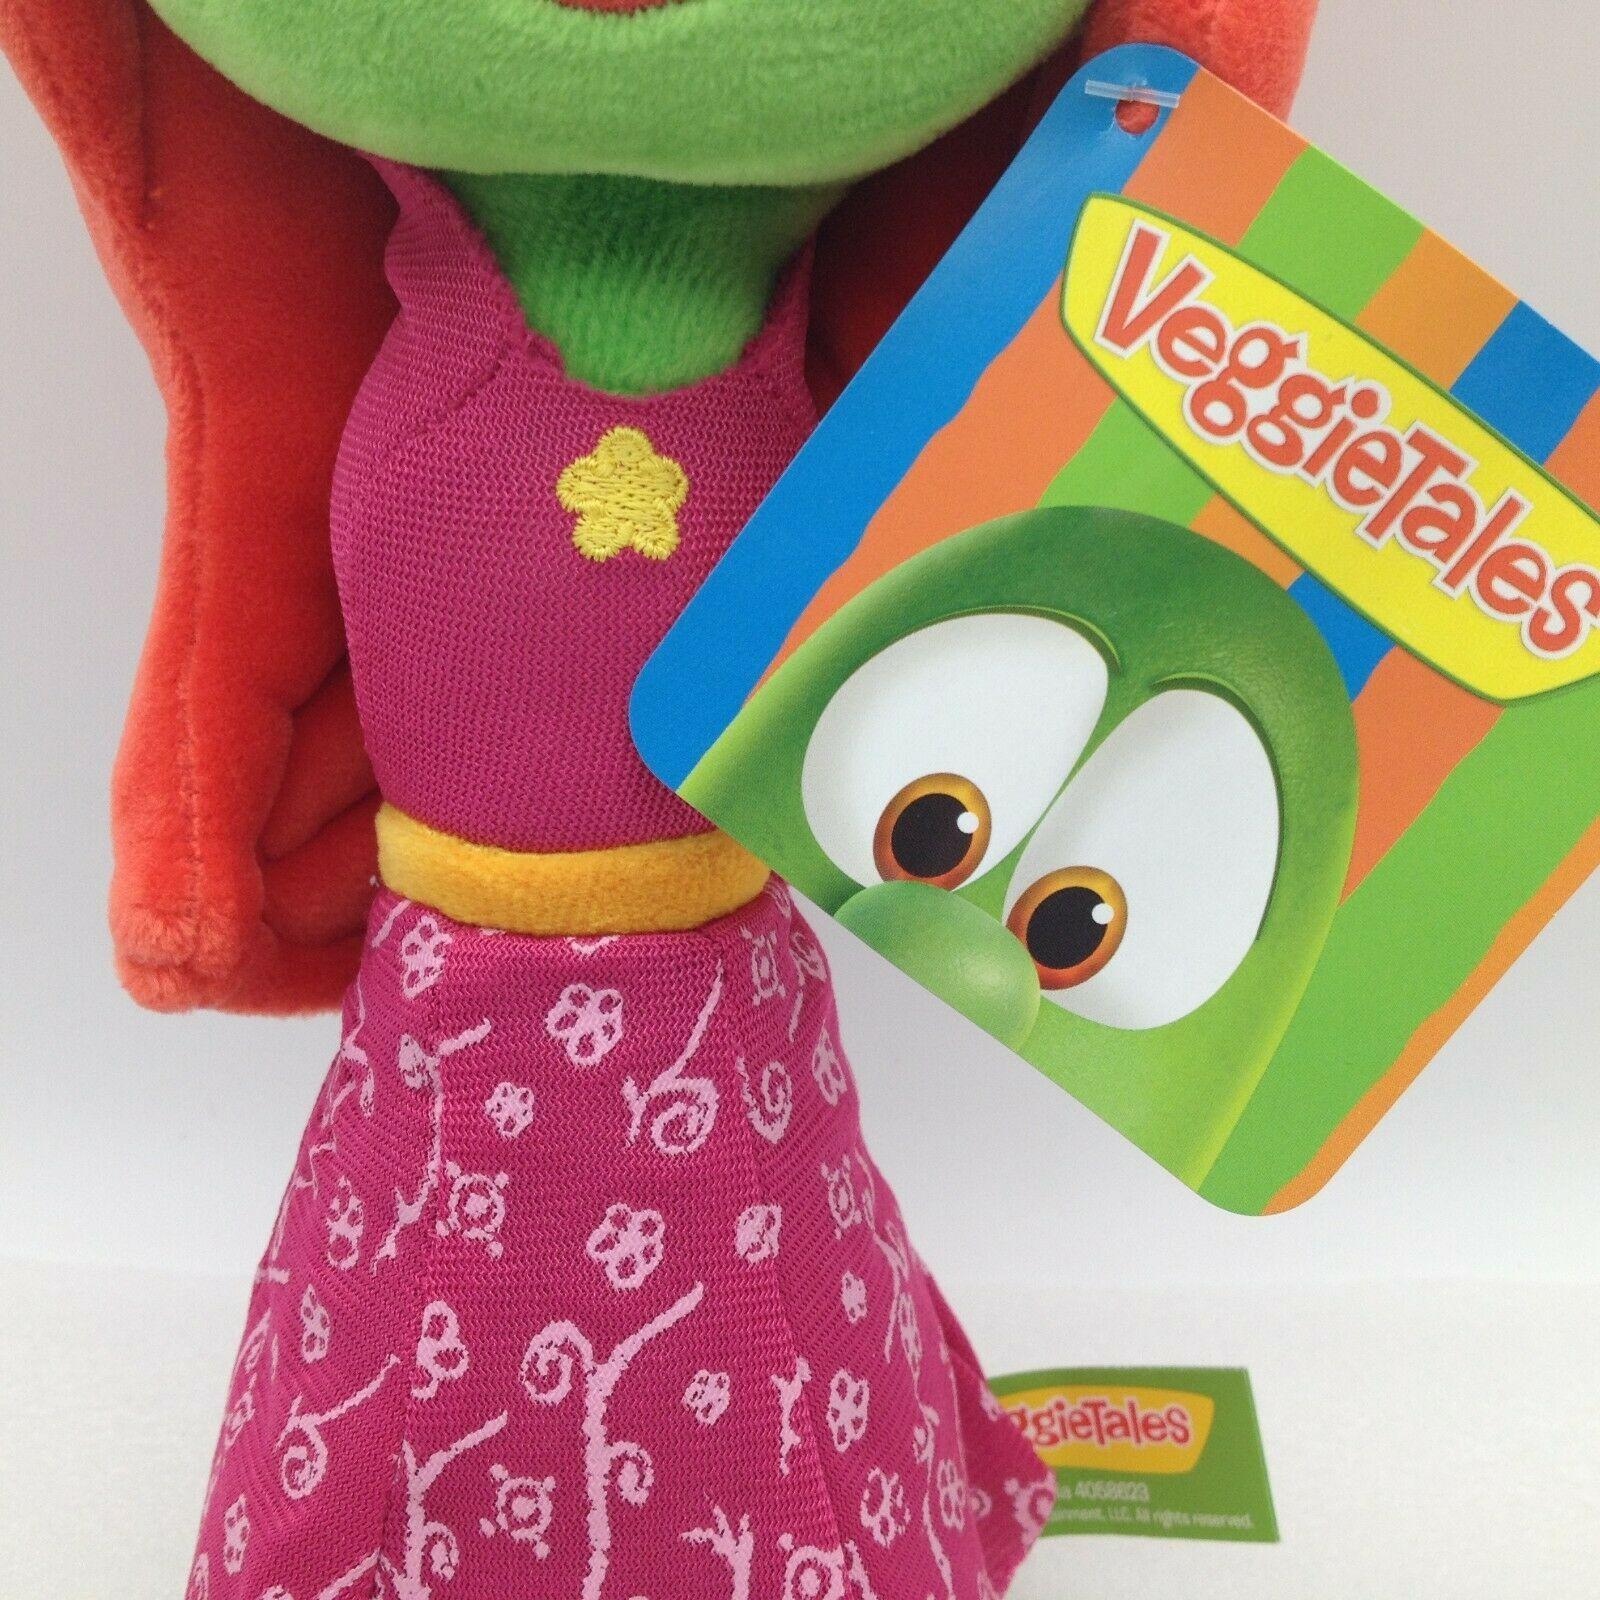 "Enesco Veggietales Petunia Rhubarb Plush Doll Toy 11"" Tall Super Soft Veggie image 6"